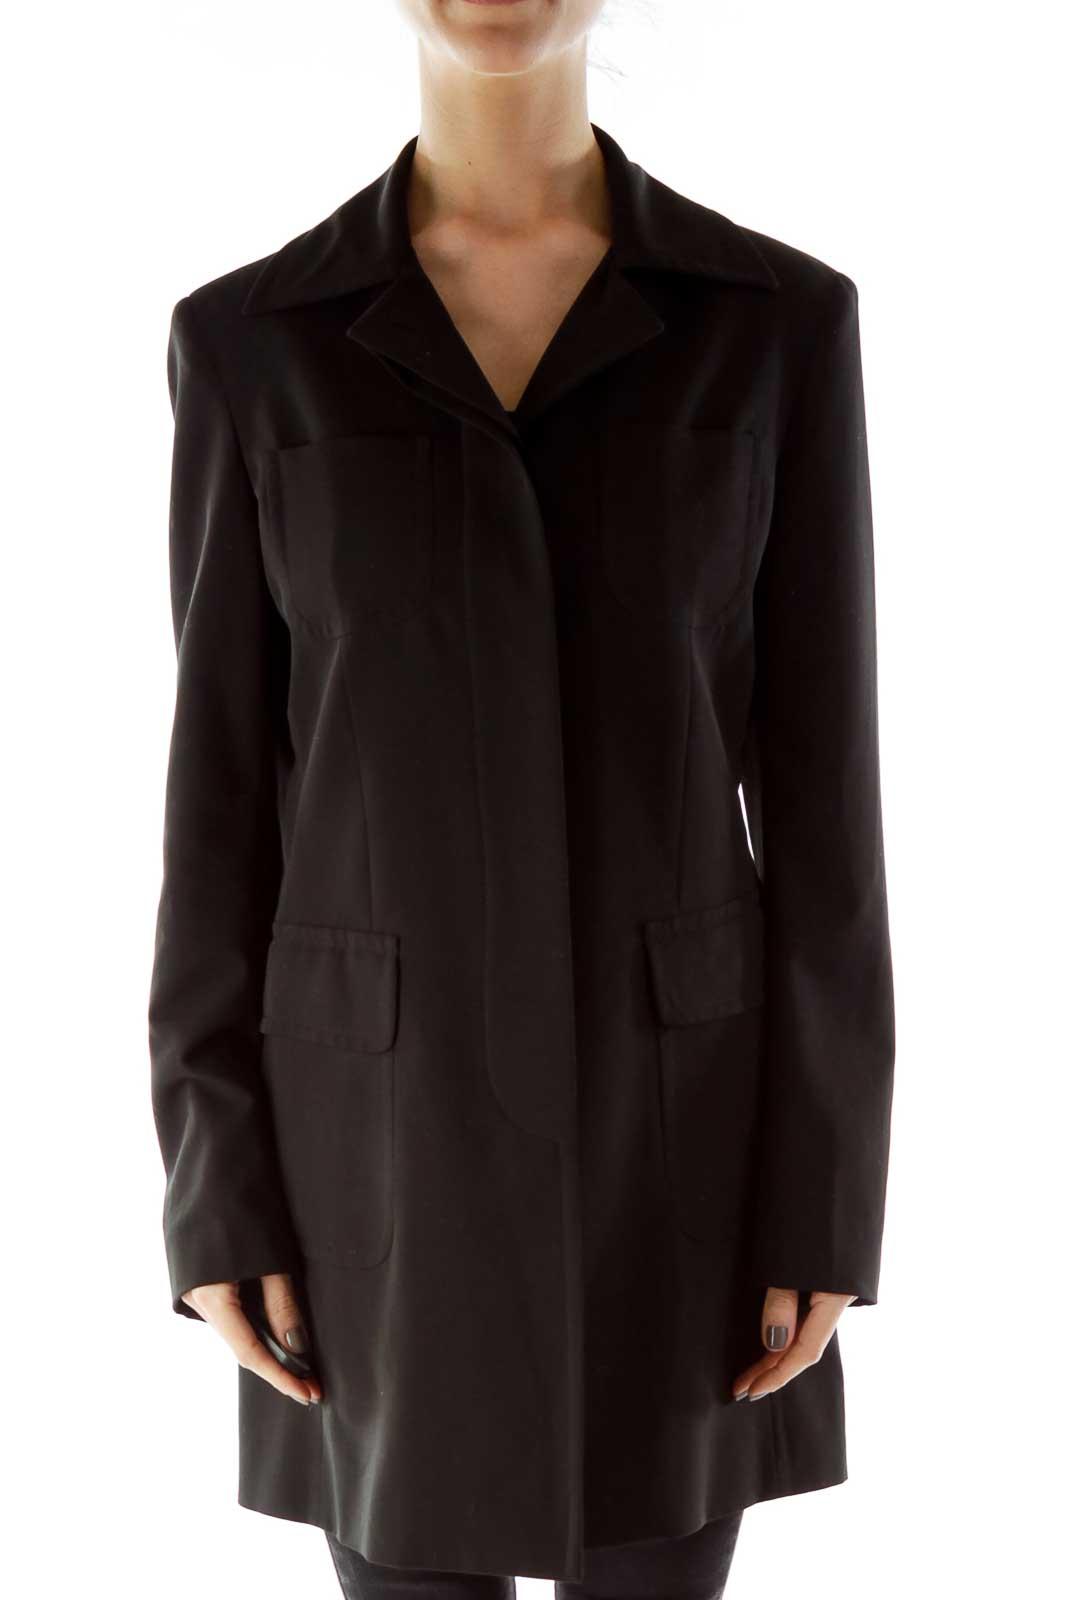 Black Single Breasted Blazer Front